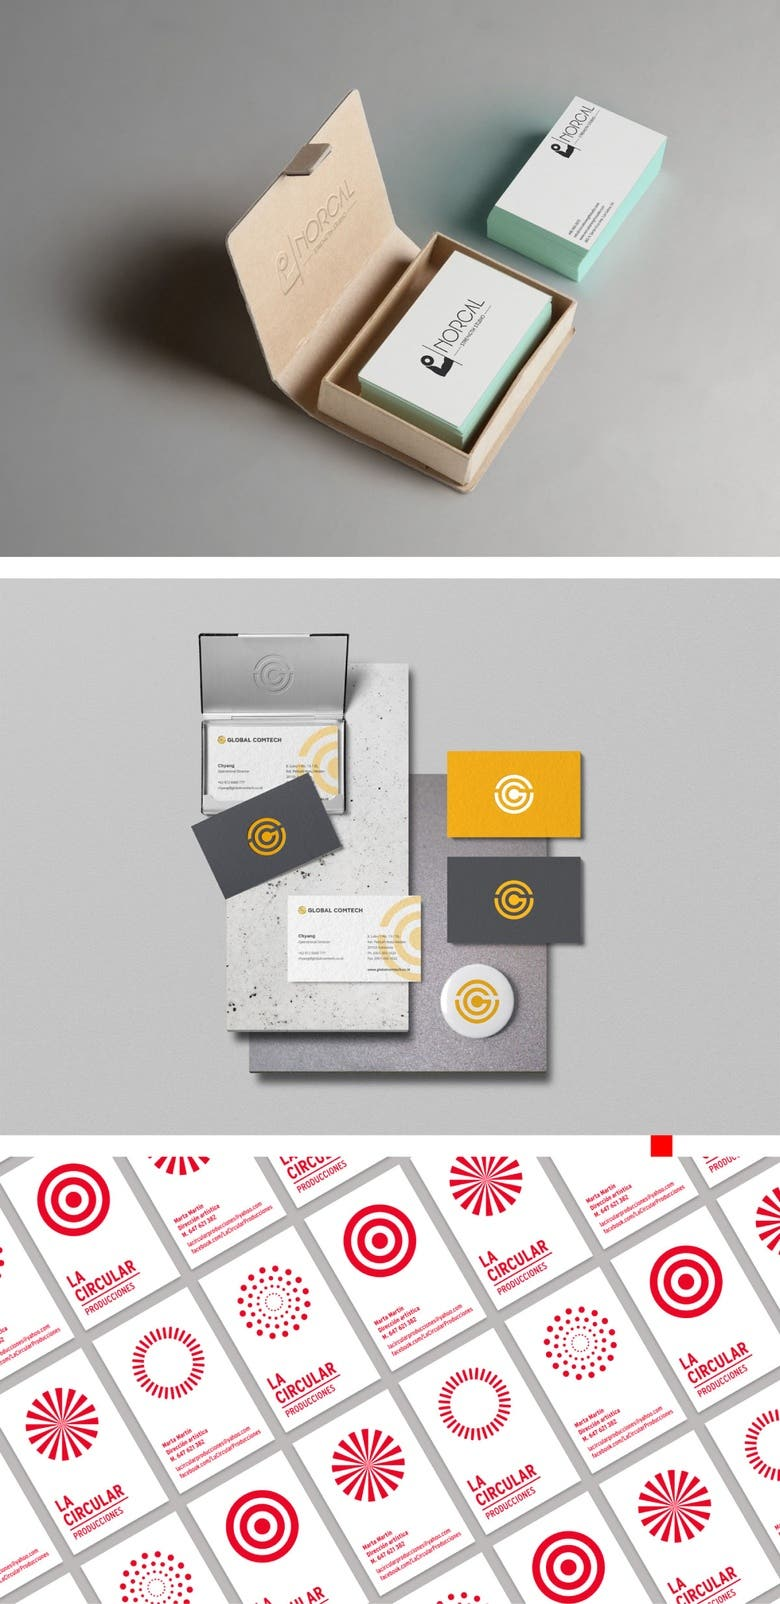 cards_2.jpg